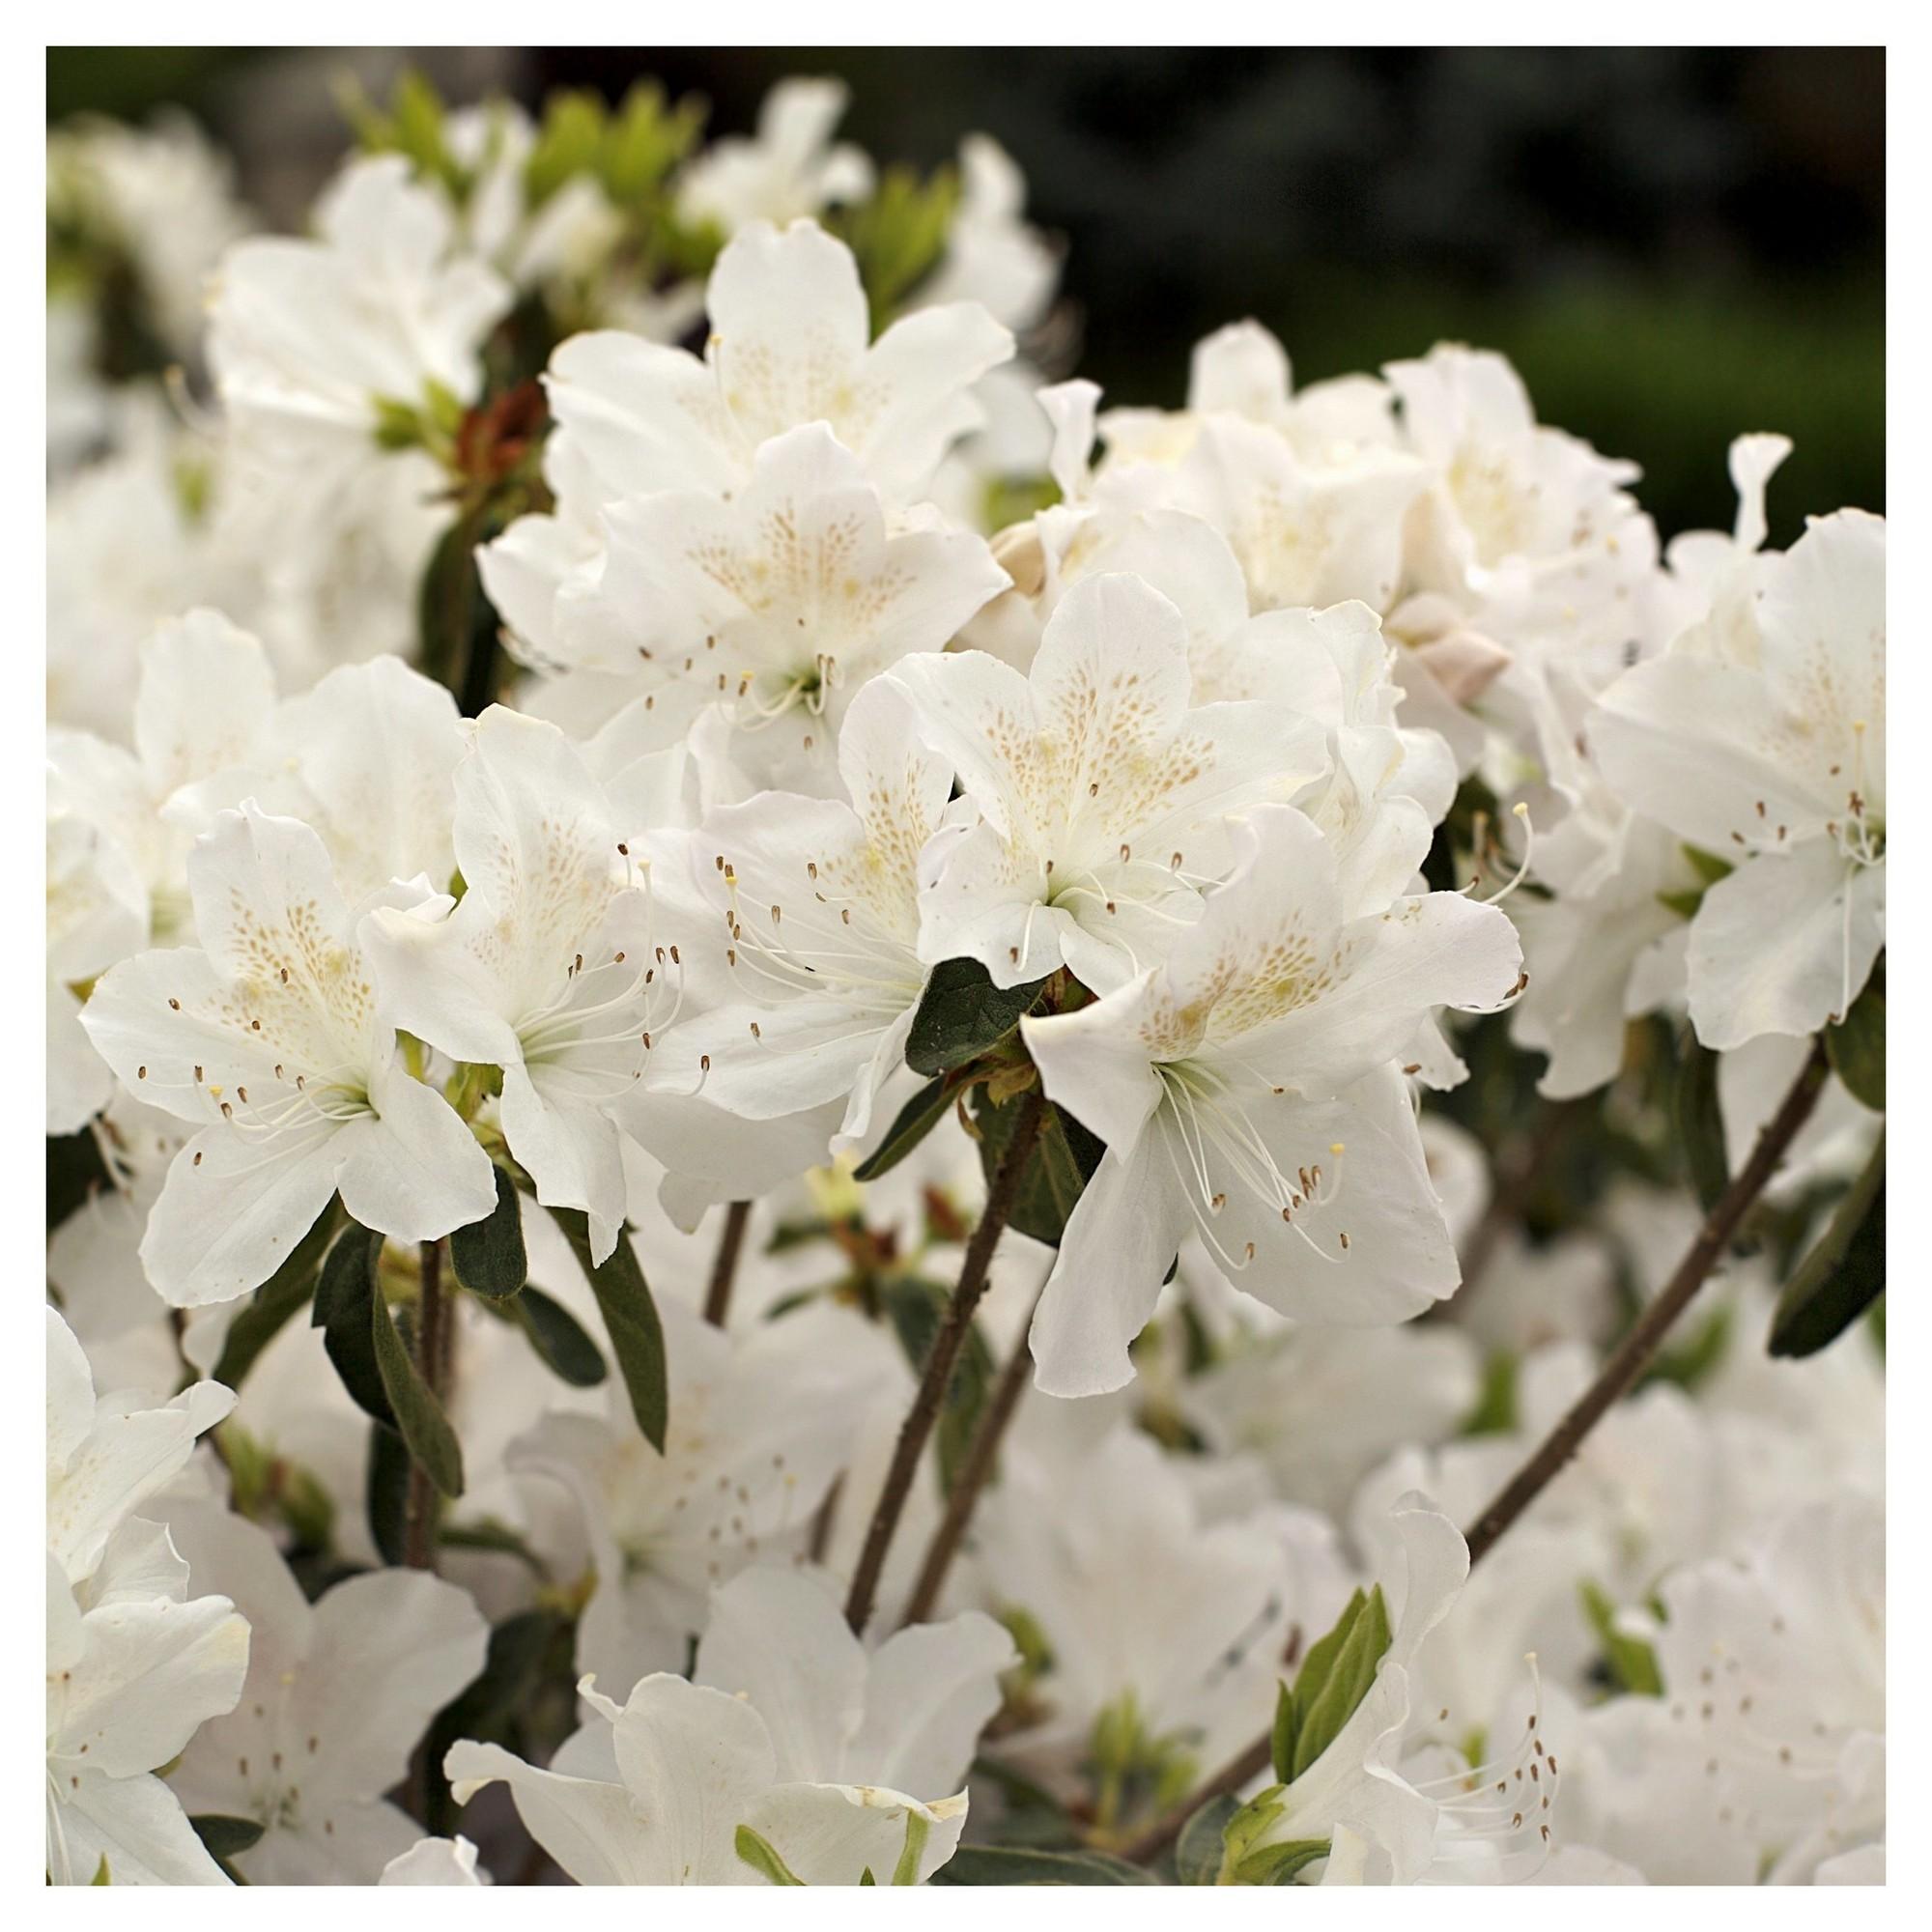 Azalea 'Snow' 1pc National Plant Network U.S.D.A